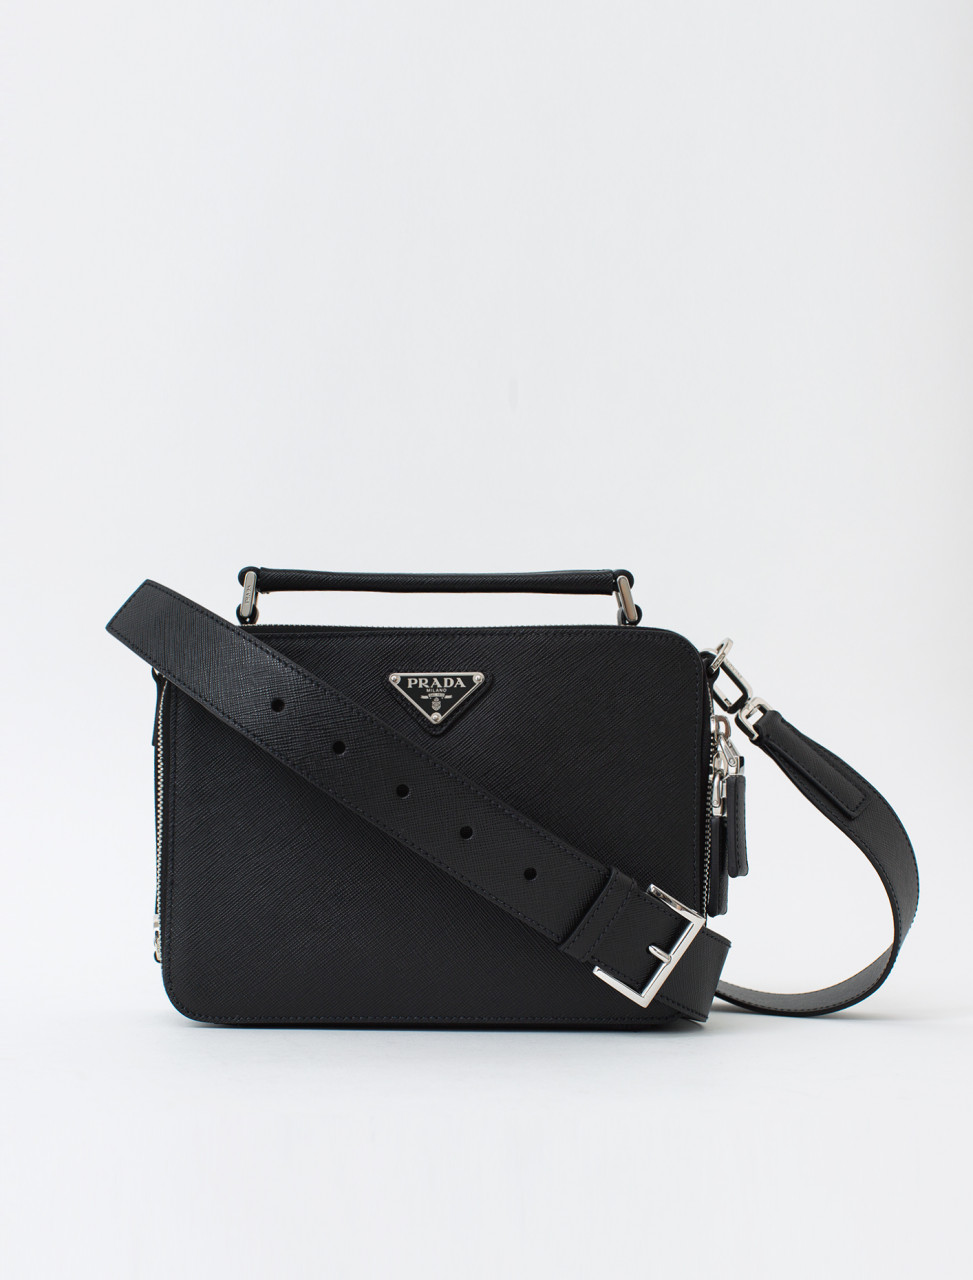 3f8976a68e134 Prada Saffiano Leather Travel Bag | Voo Store Berlin | Worldwide ...